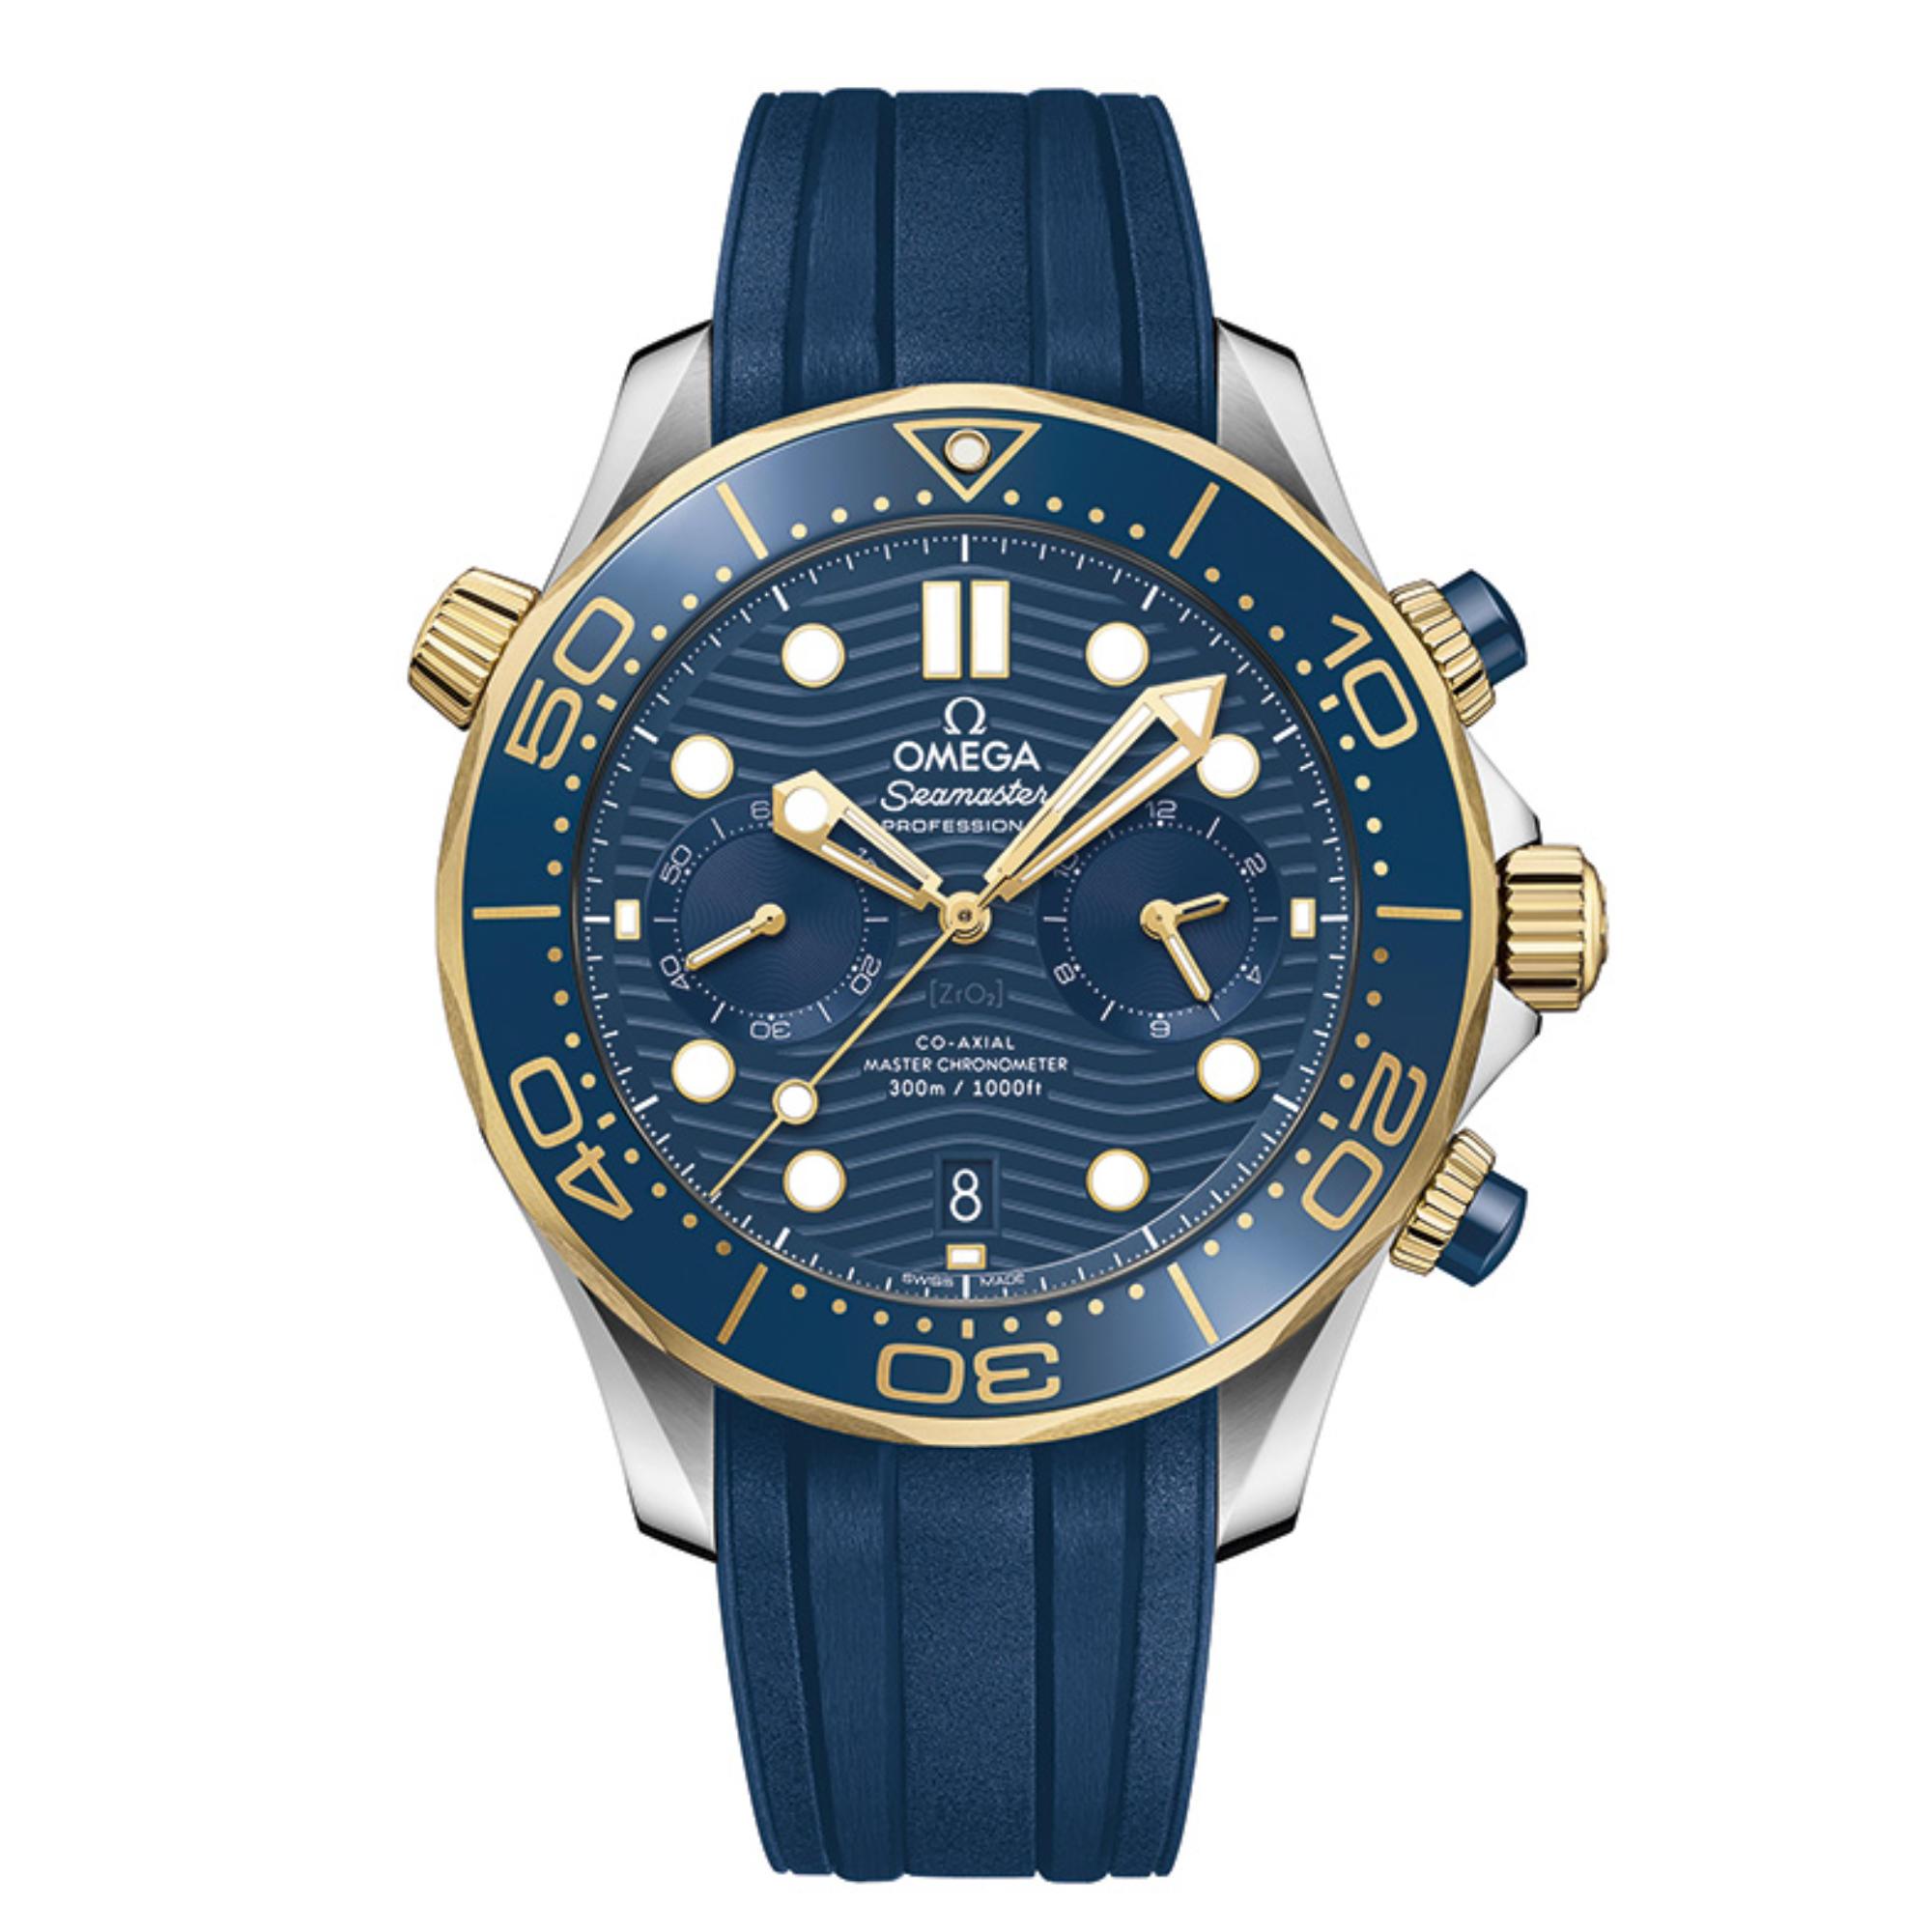 Omega - Seamaster Diver 300 M Co-Axial Master Chronometer Chronograph